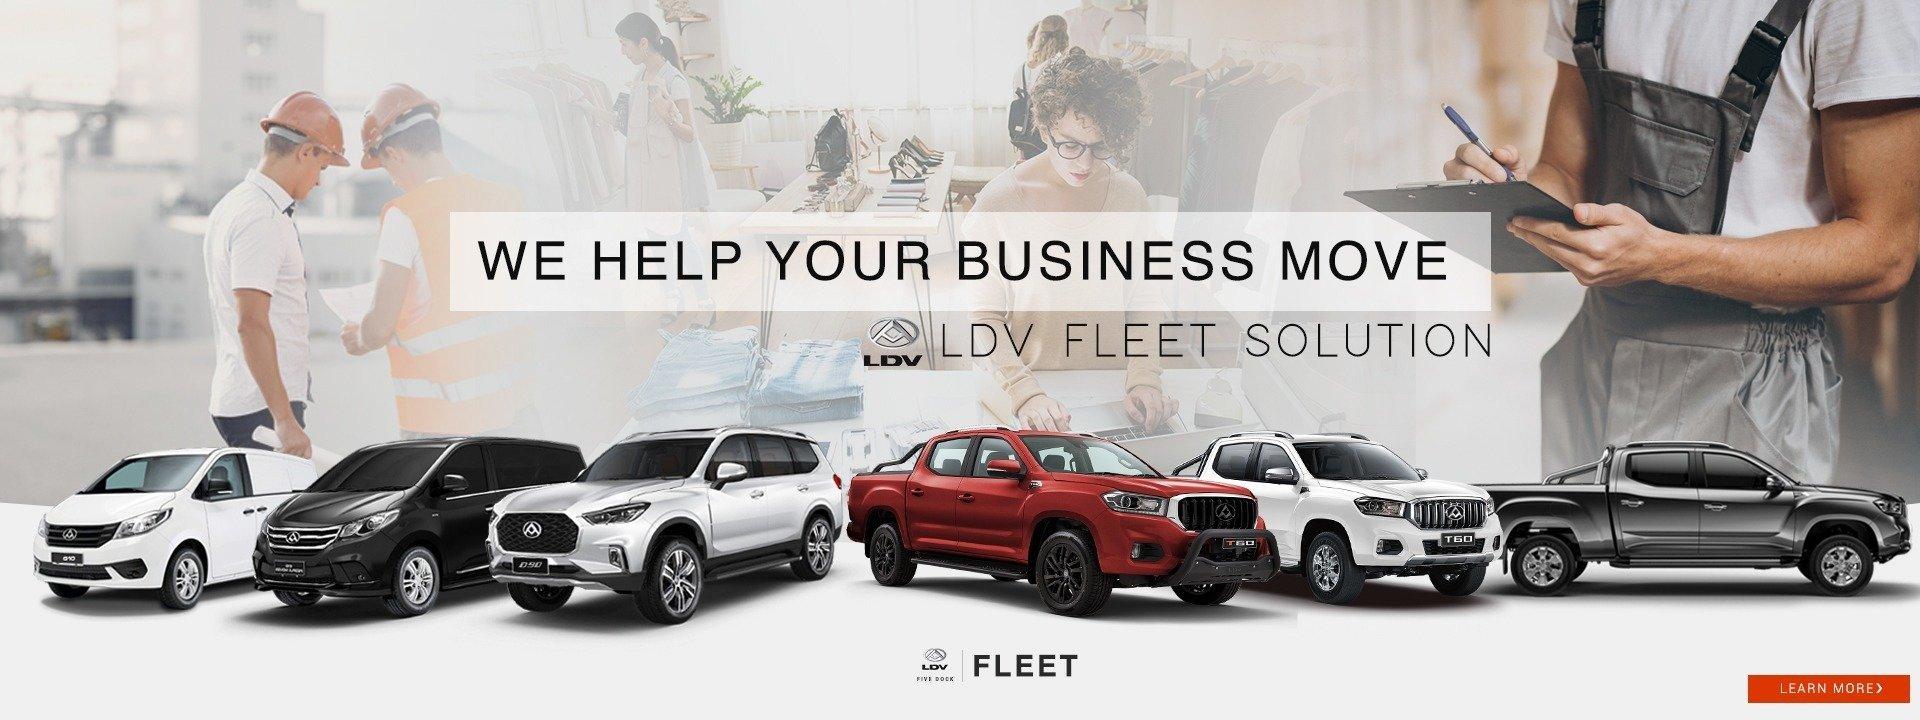 LDV Fleet